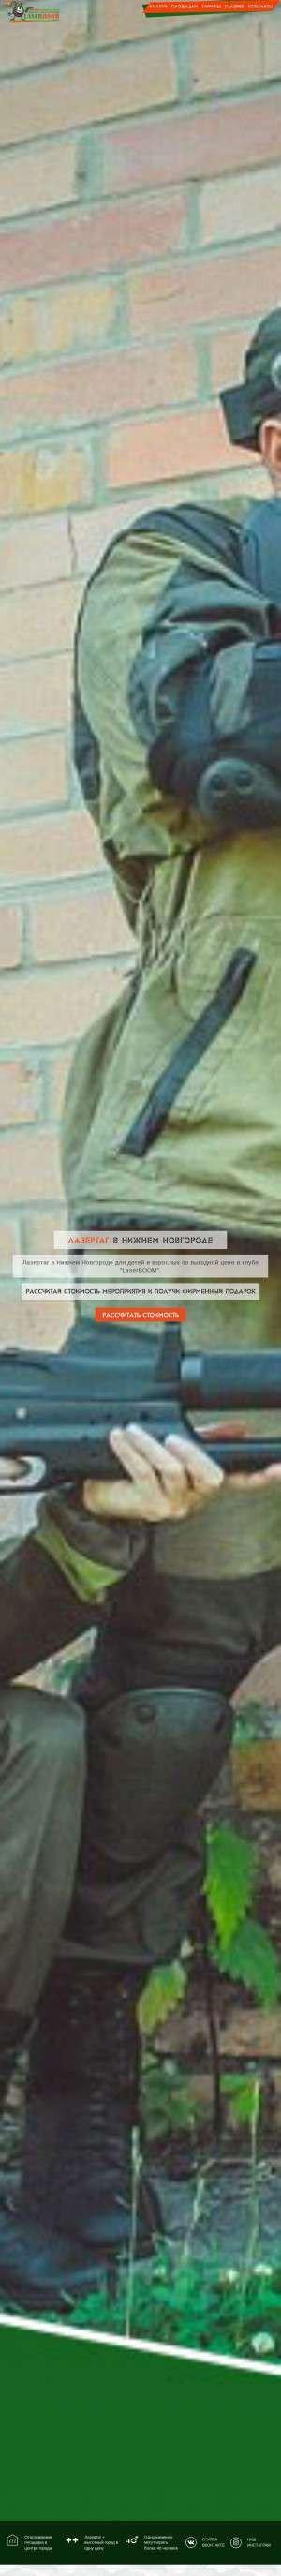 Предпросмотр для laserboom52.ru — Лазертаг-клуб Laserboom